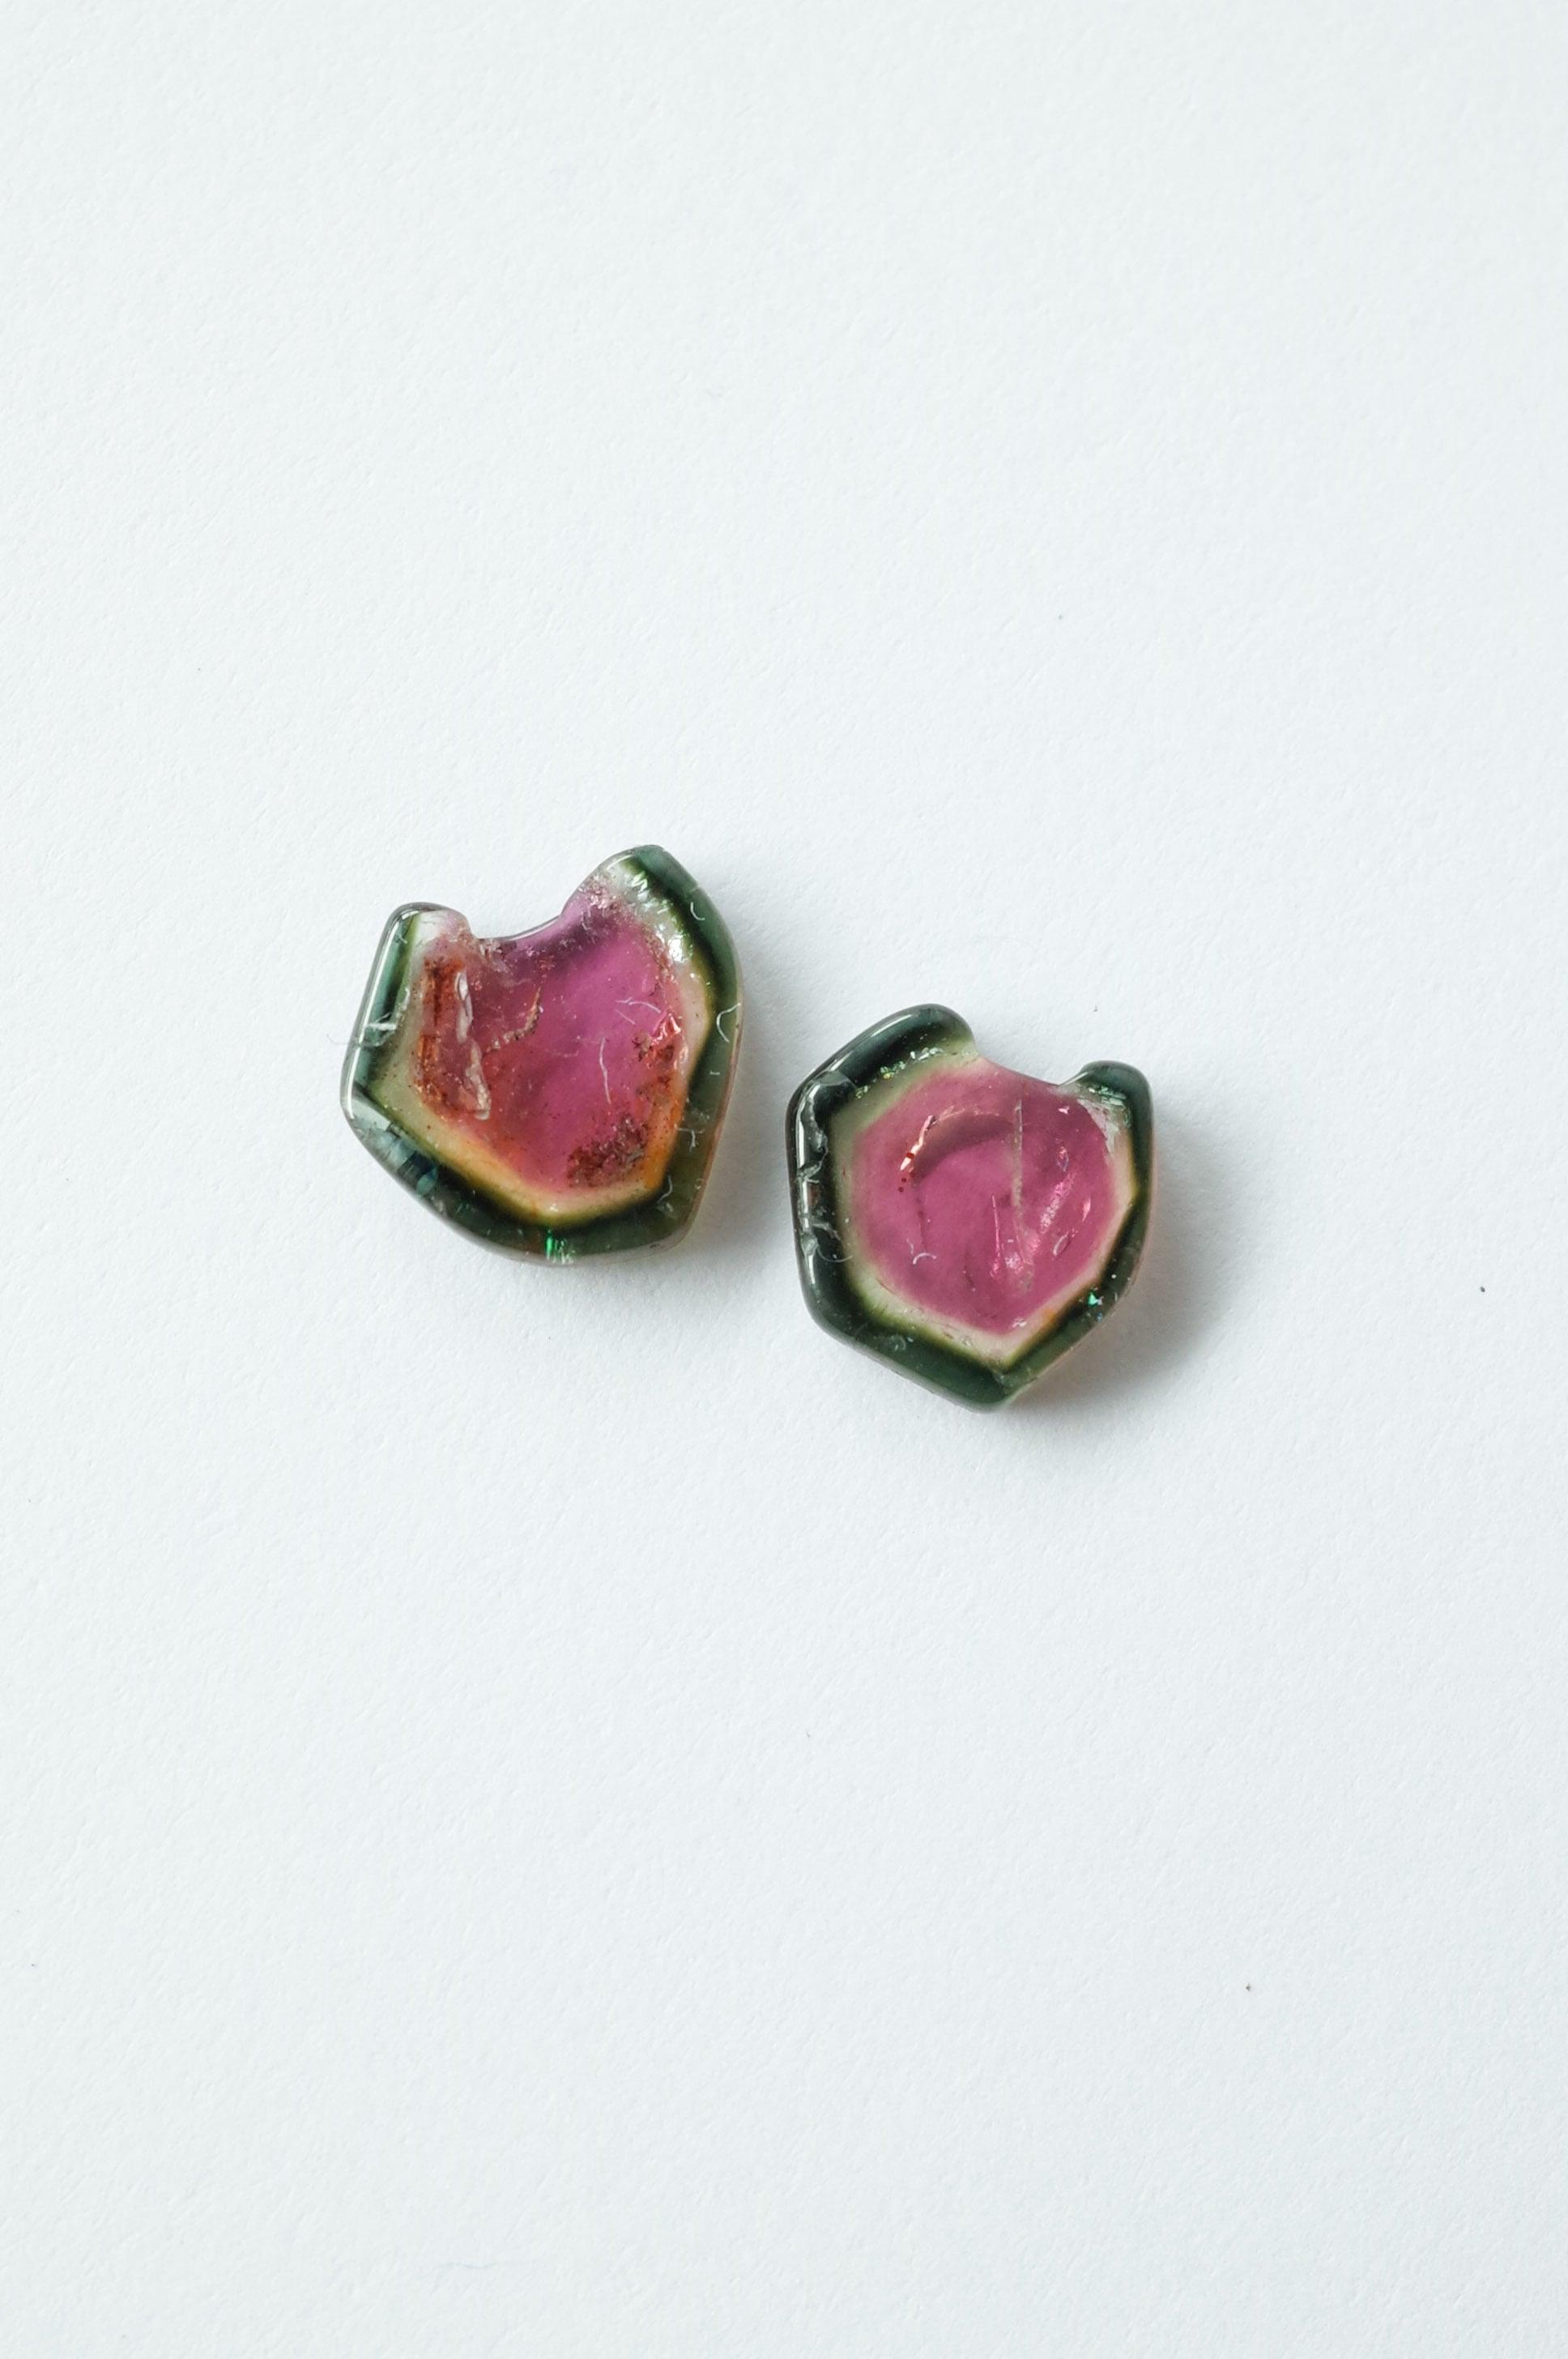 Water Melon Tourmaline / pair-006